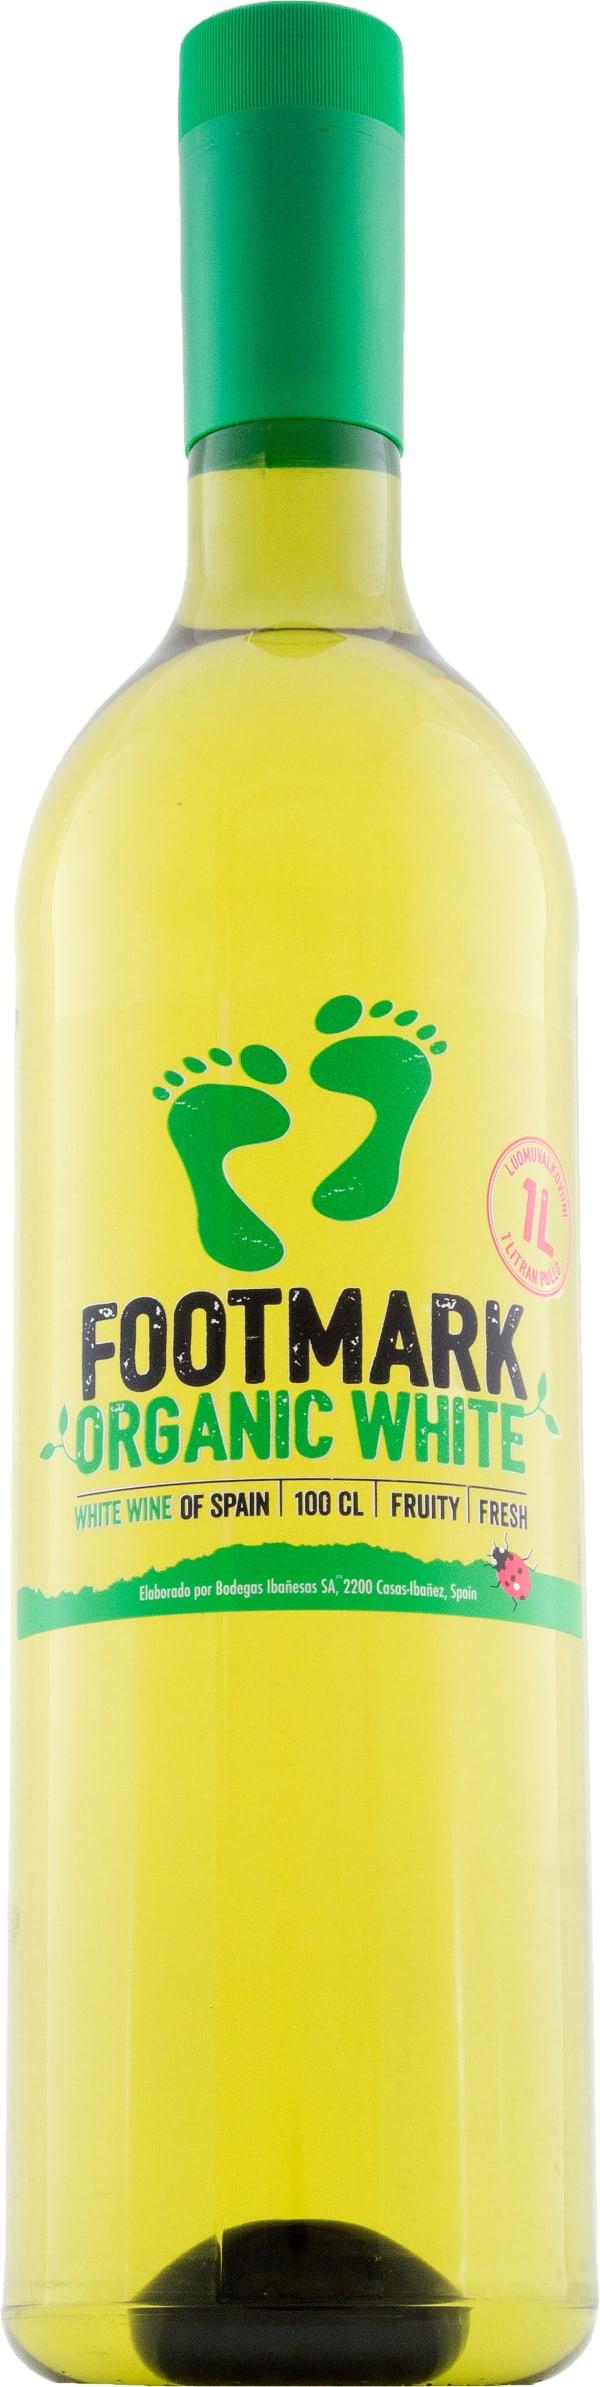 Footmark Organic White muovipullo